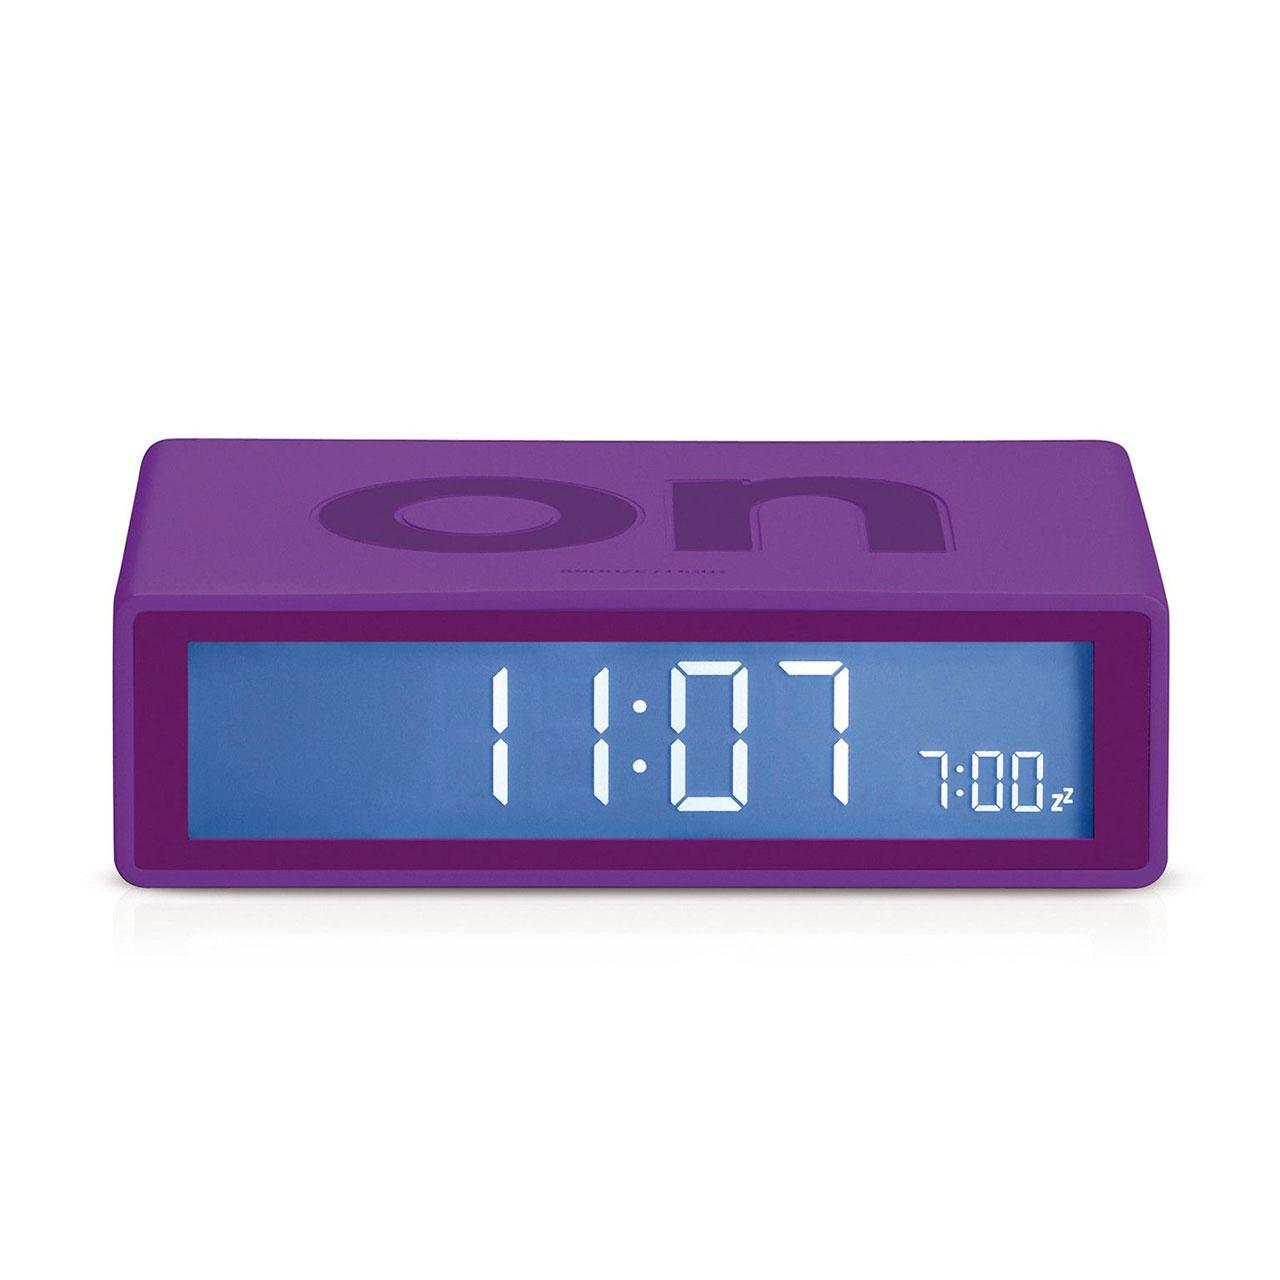 LEXON Flip+ LCD alarm clock LR150F0 purple | the design gift shop